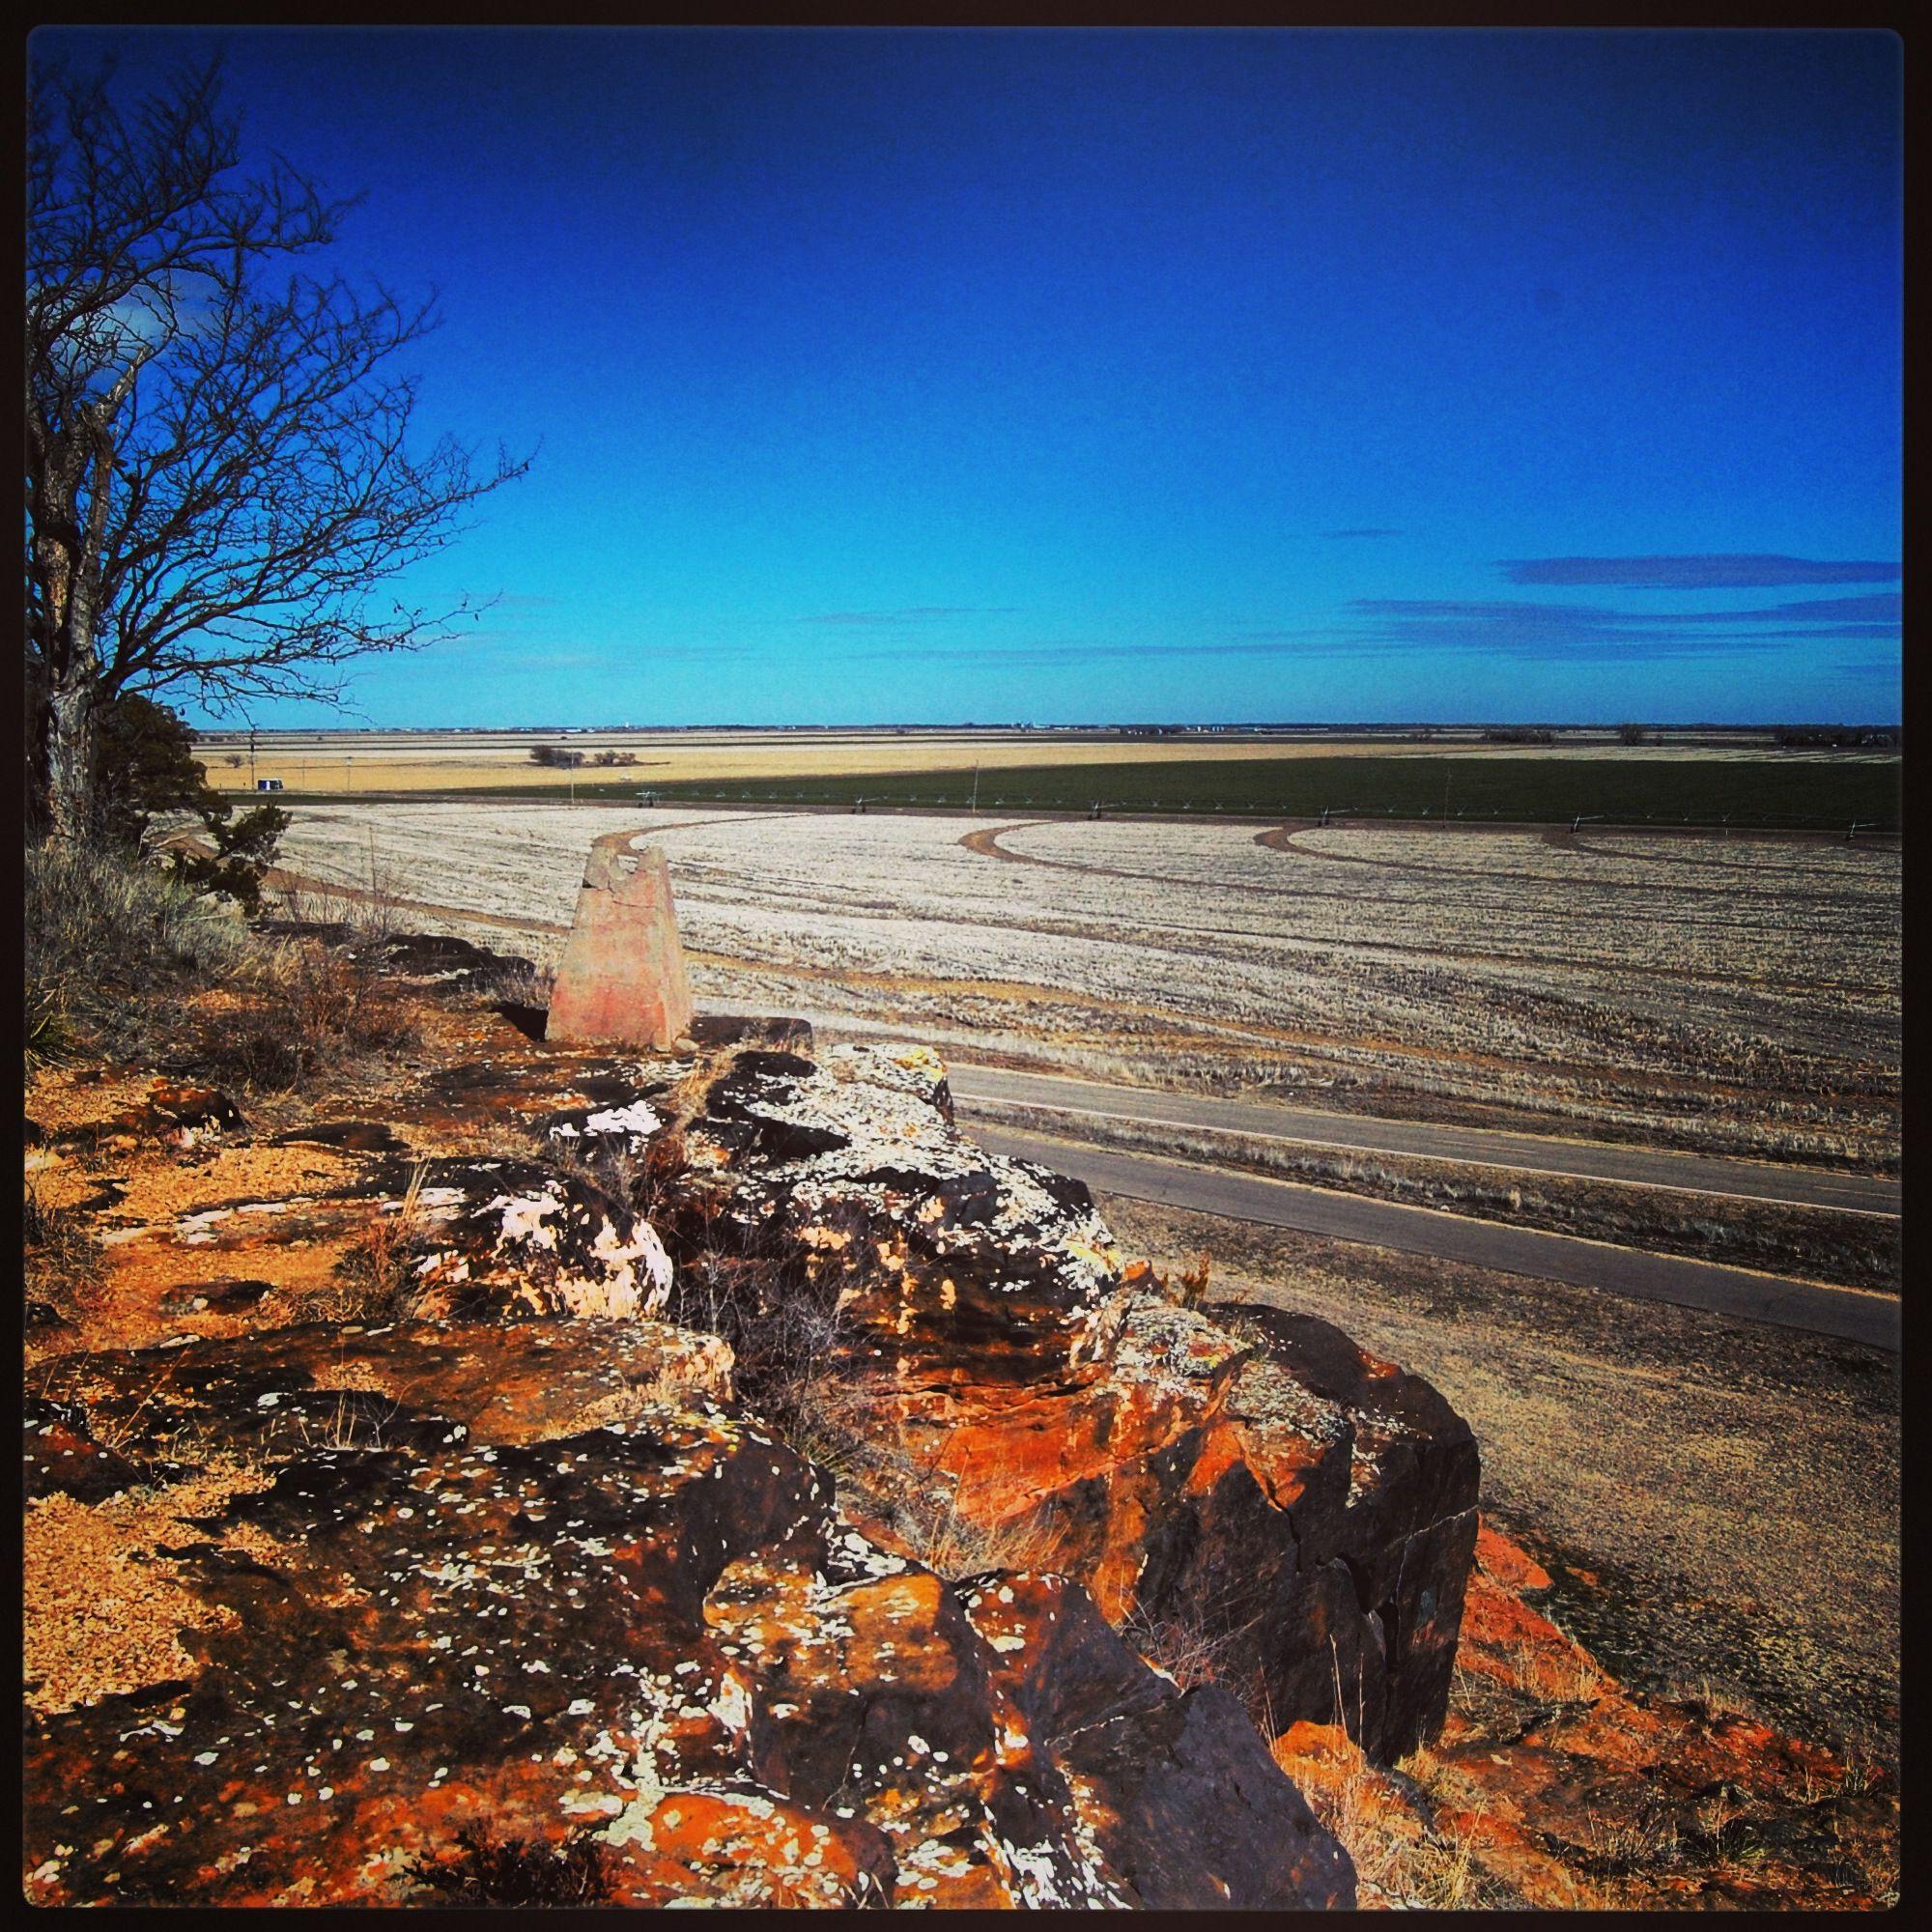 Pawnee rock Santa fe trail, Time travel, Trail